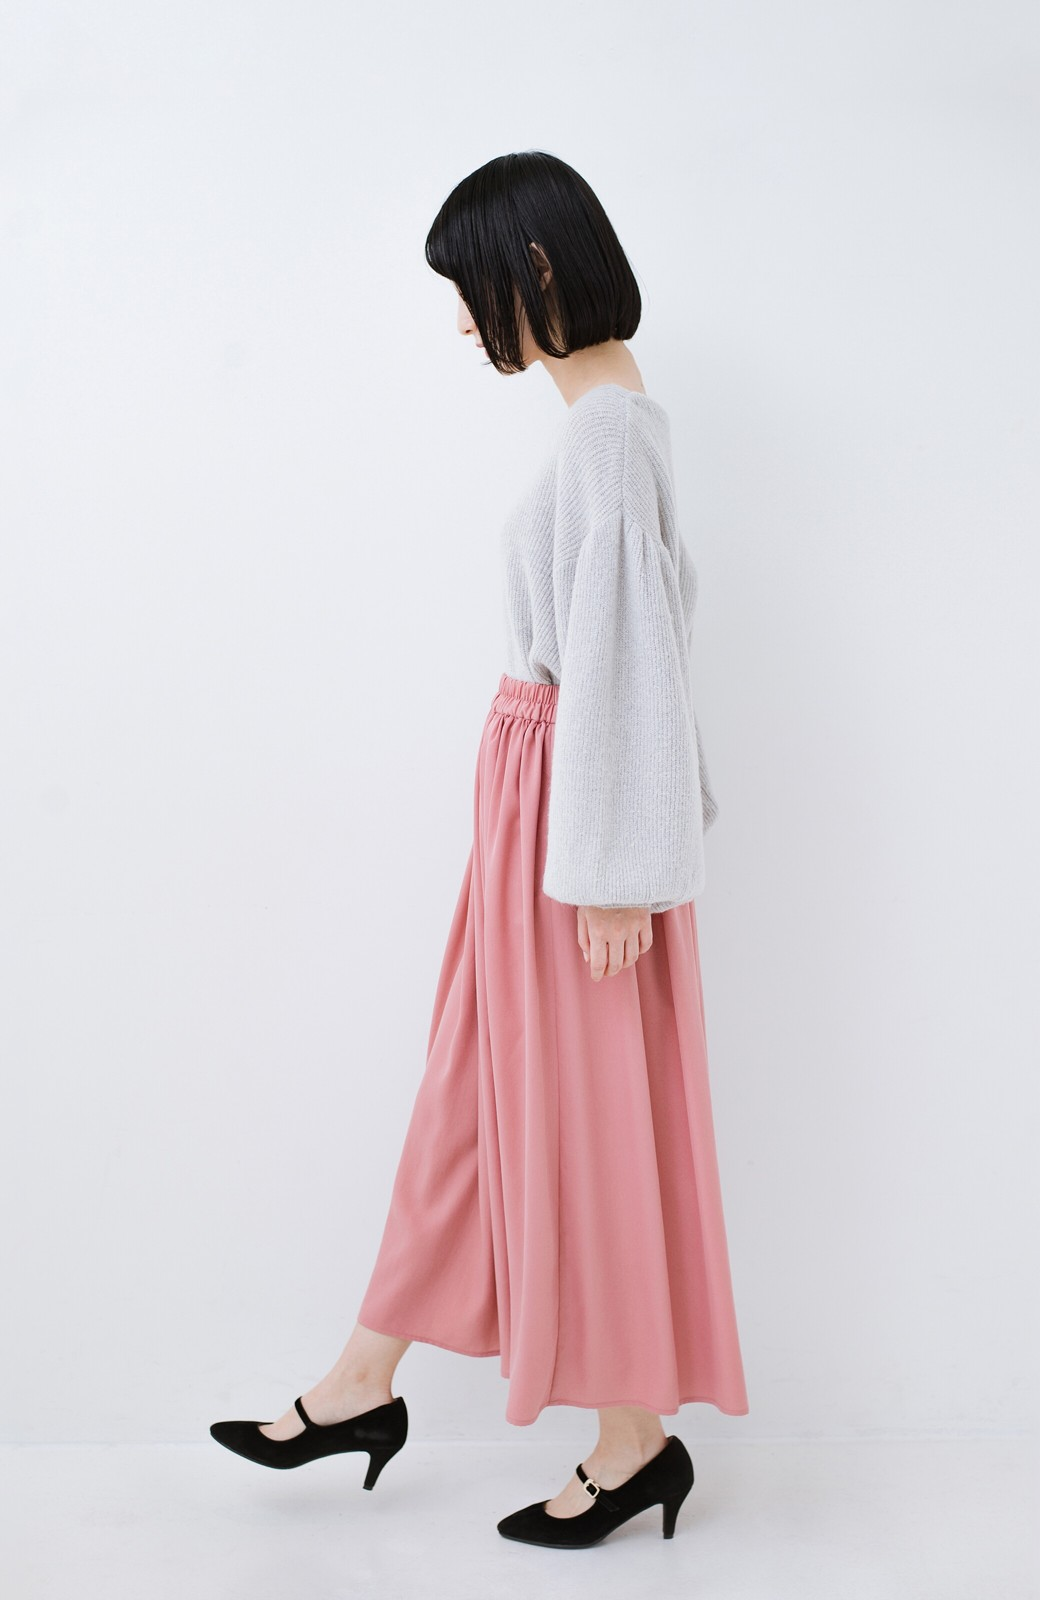 haco! きれいなお姉さんになれる気がするミモレ丈フレアースカート <ピンク>の商品写真13